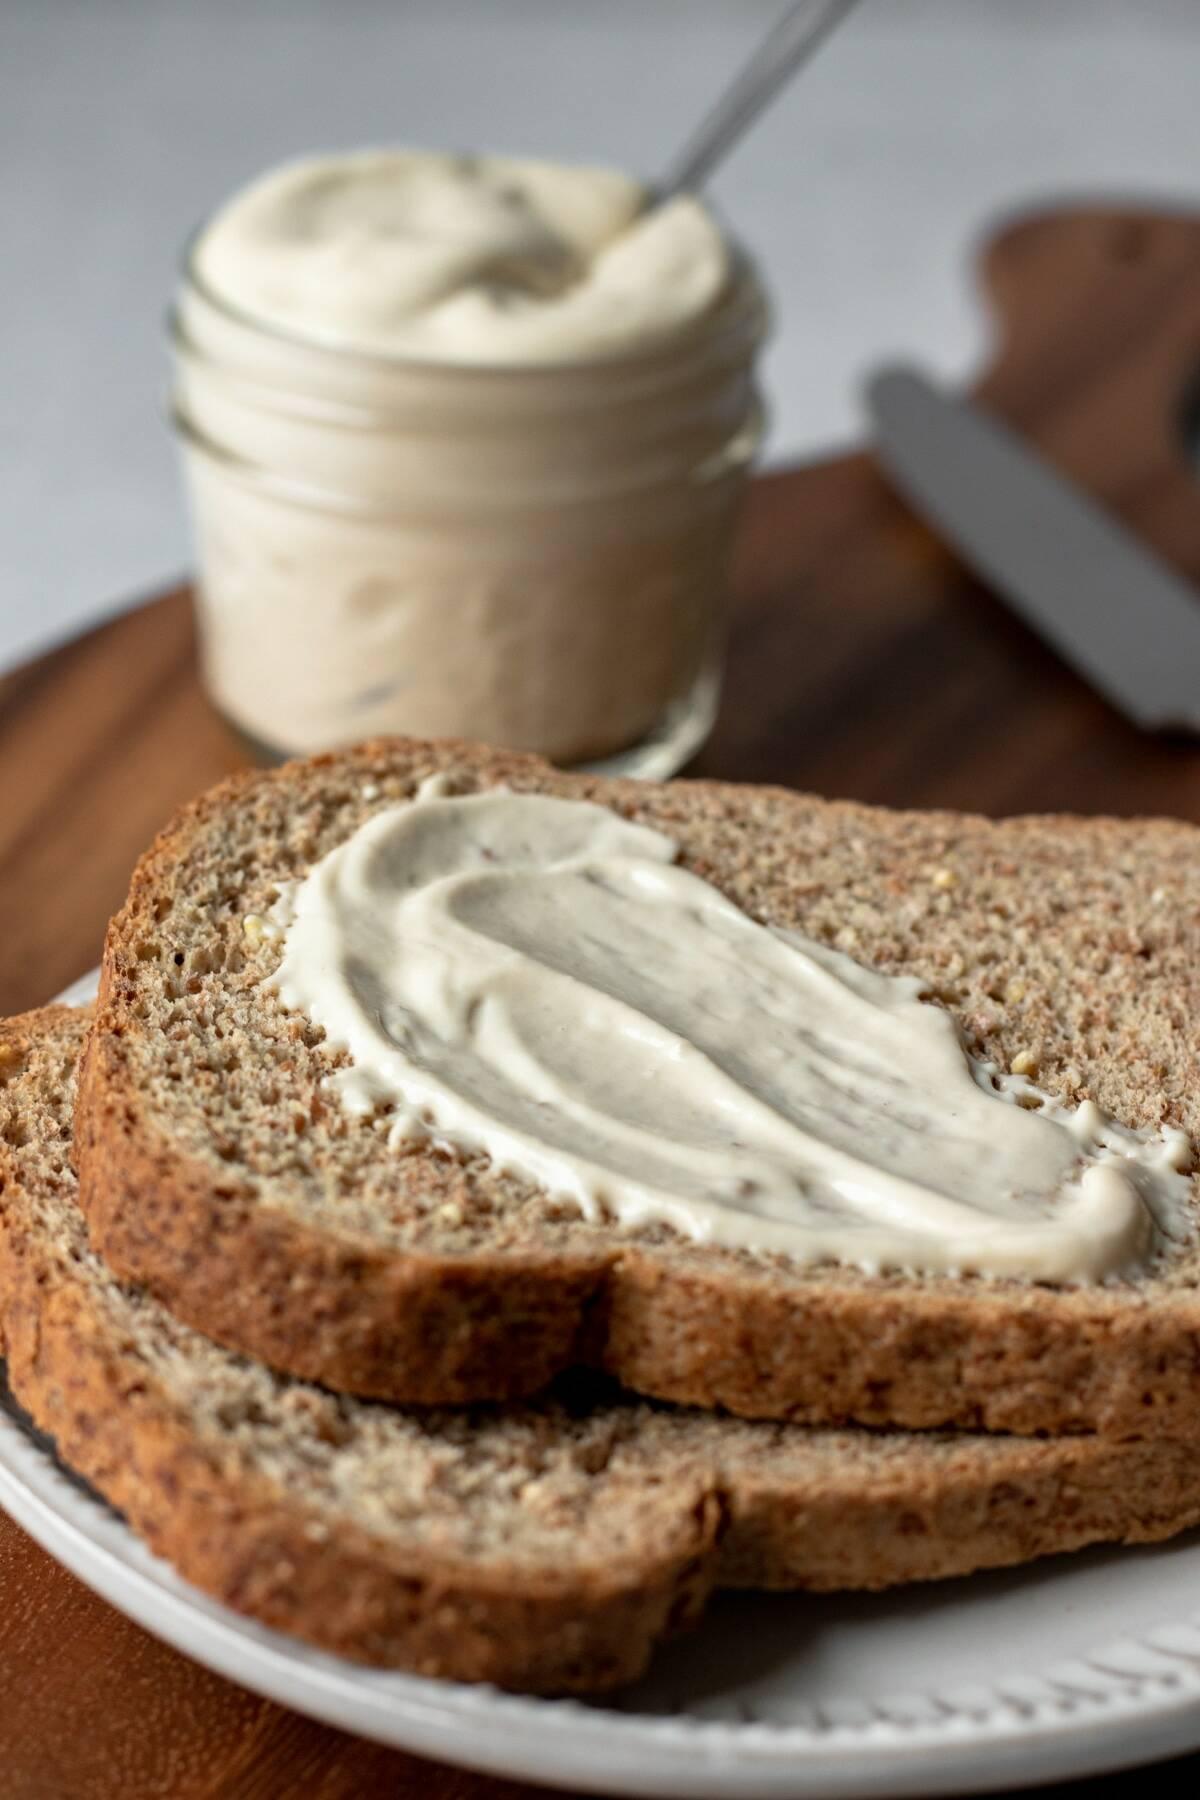 aquafaba mayo spread on a piece of toasted bread.